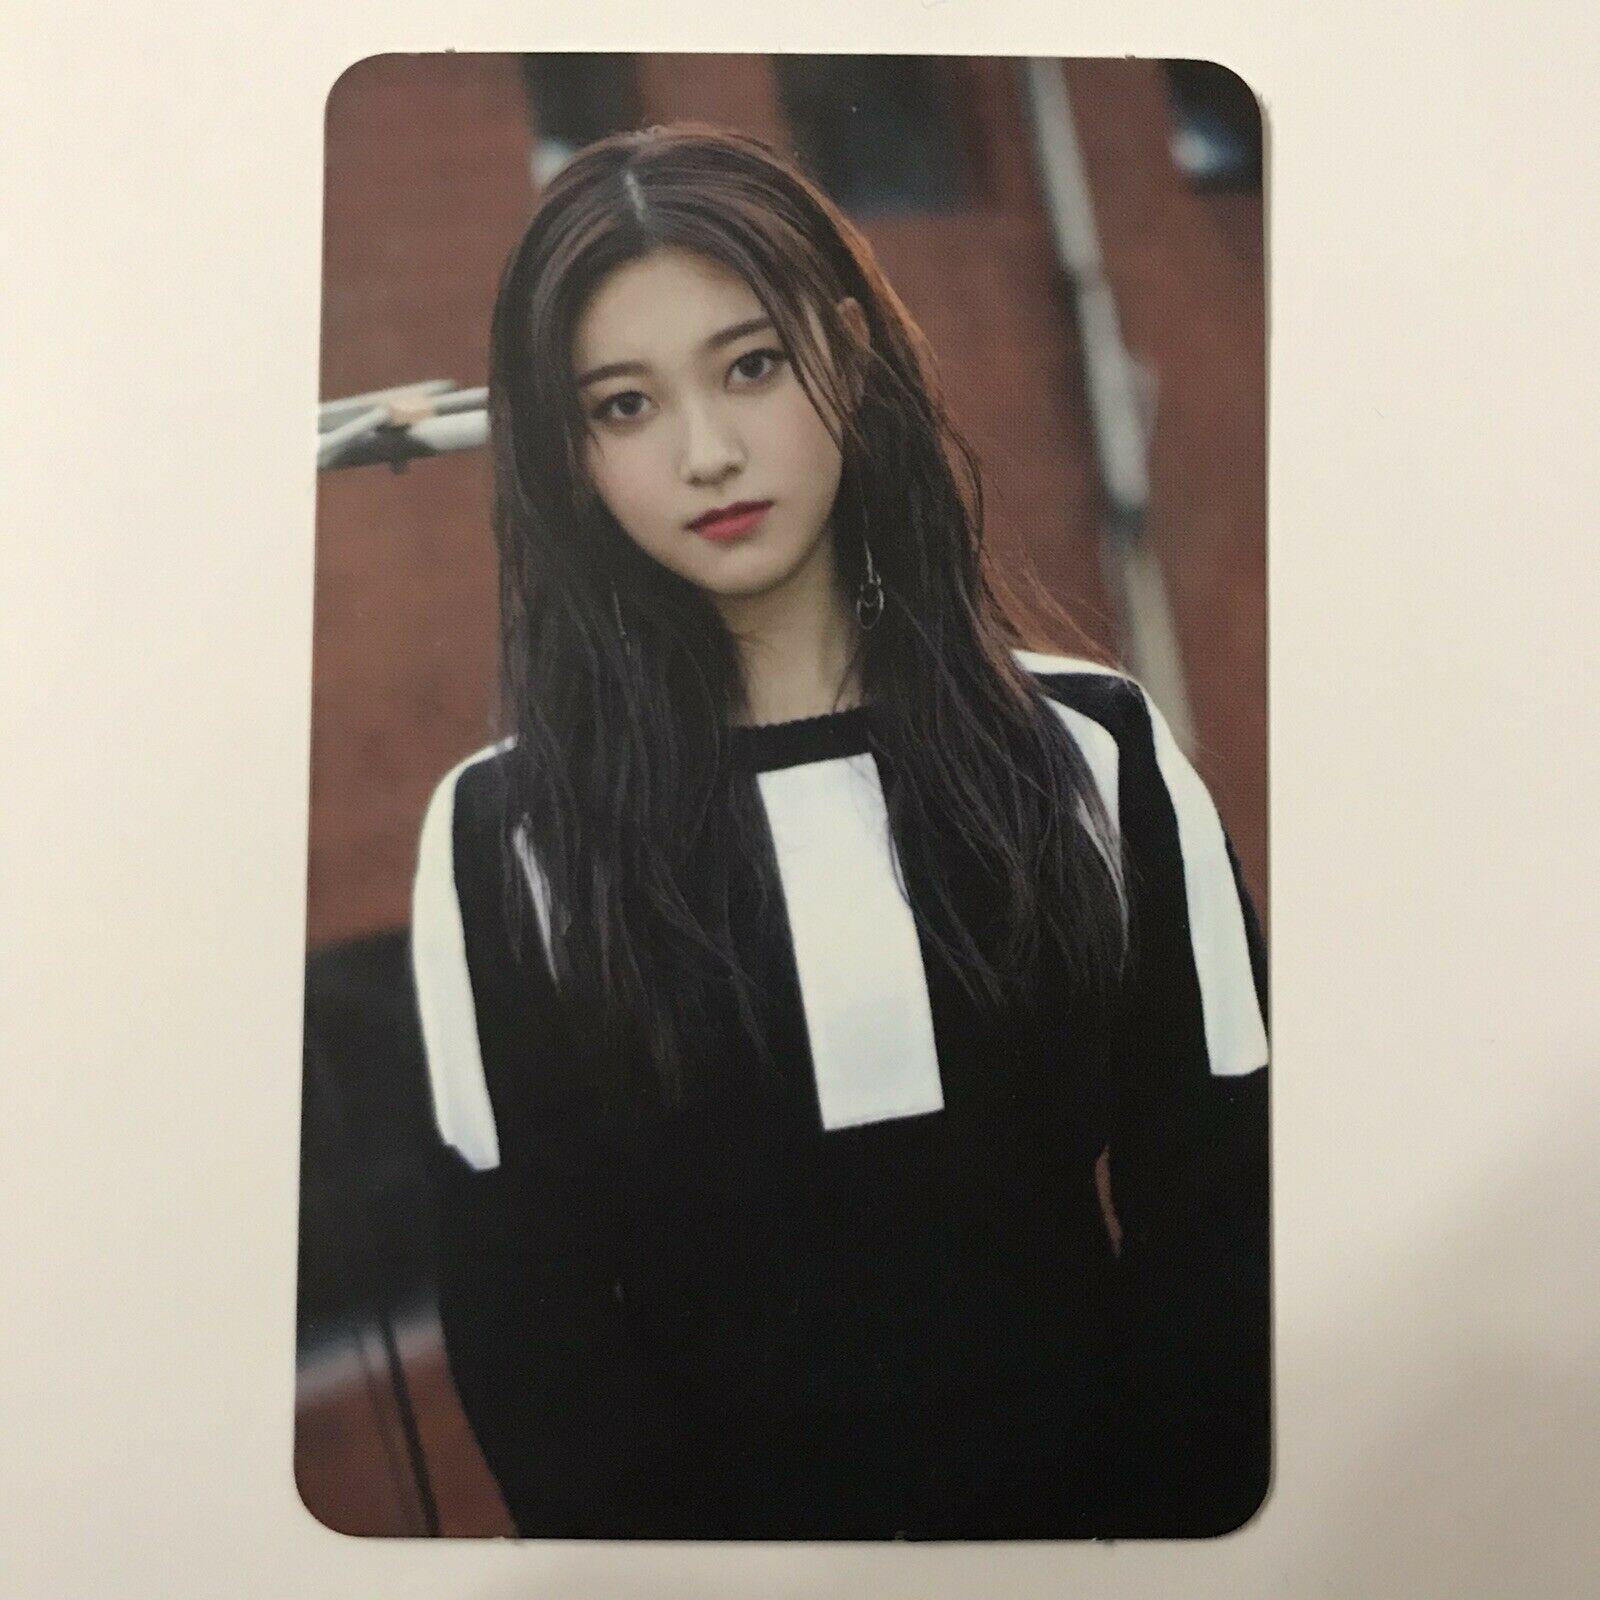 mostexpensivephotocards_16